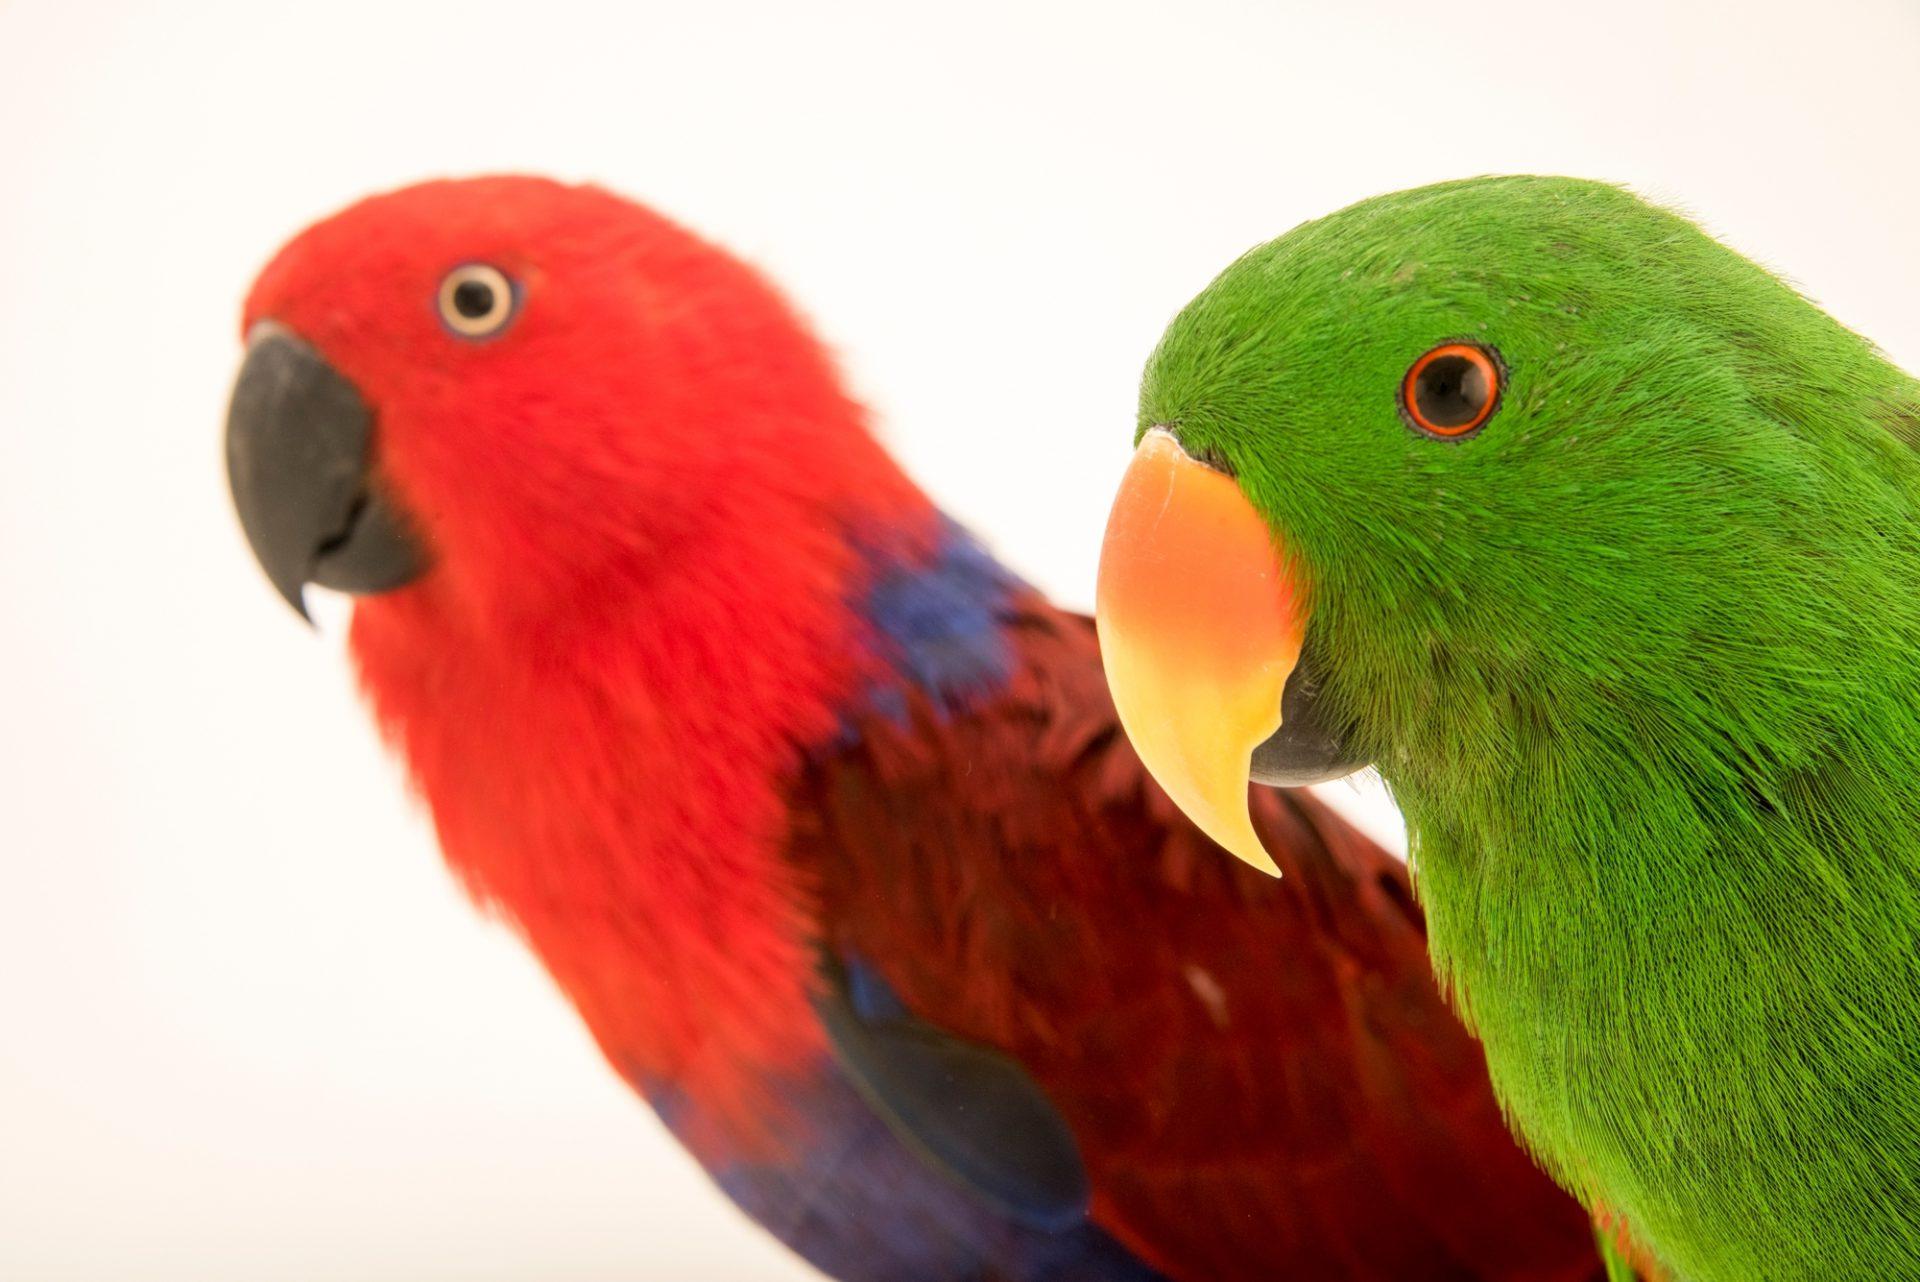 Photo: A male and a female Aru Island eclectus parrot, Eclectus roratus aruensis, at Loro Parque Fundacion.